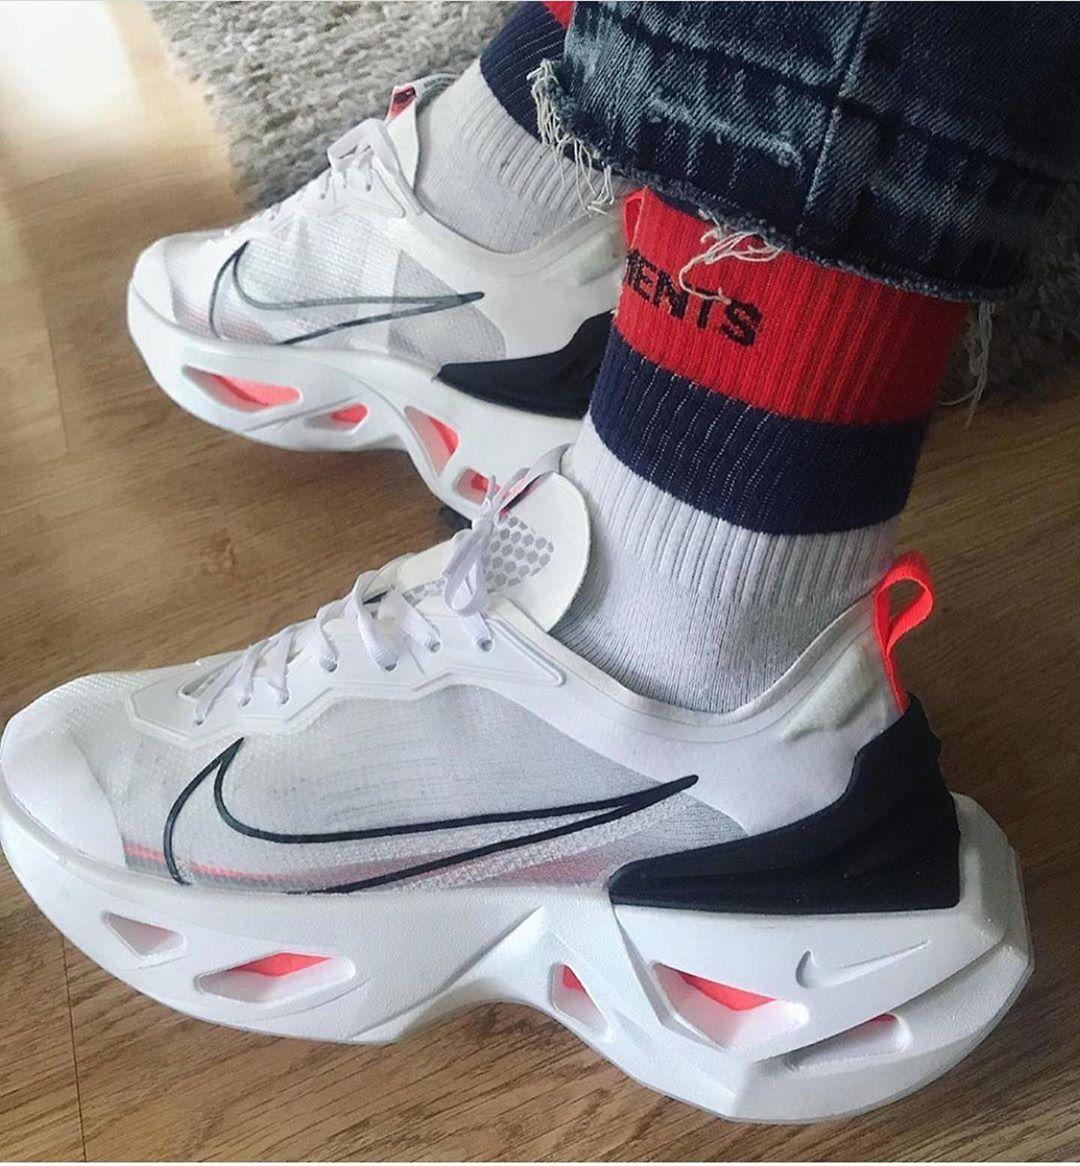 Una oración pedir Inspirar  Nike Zoom X Vista Grind   Sneakers men fashion, Nike zoom, Nike women  outfits